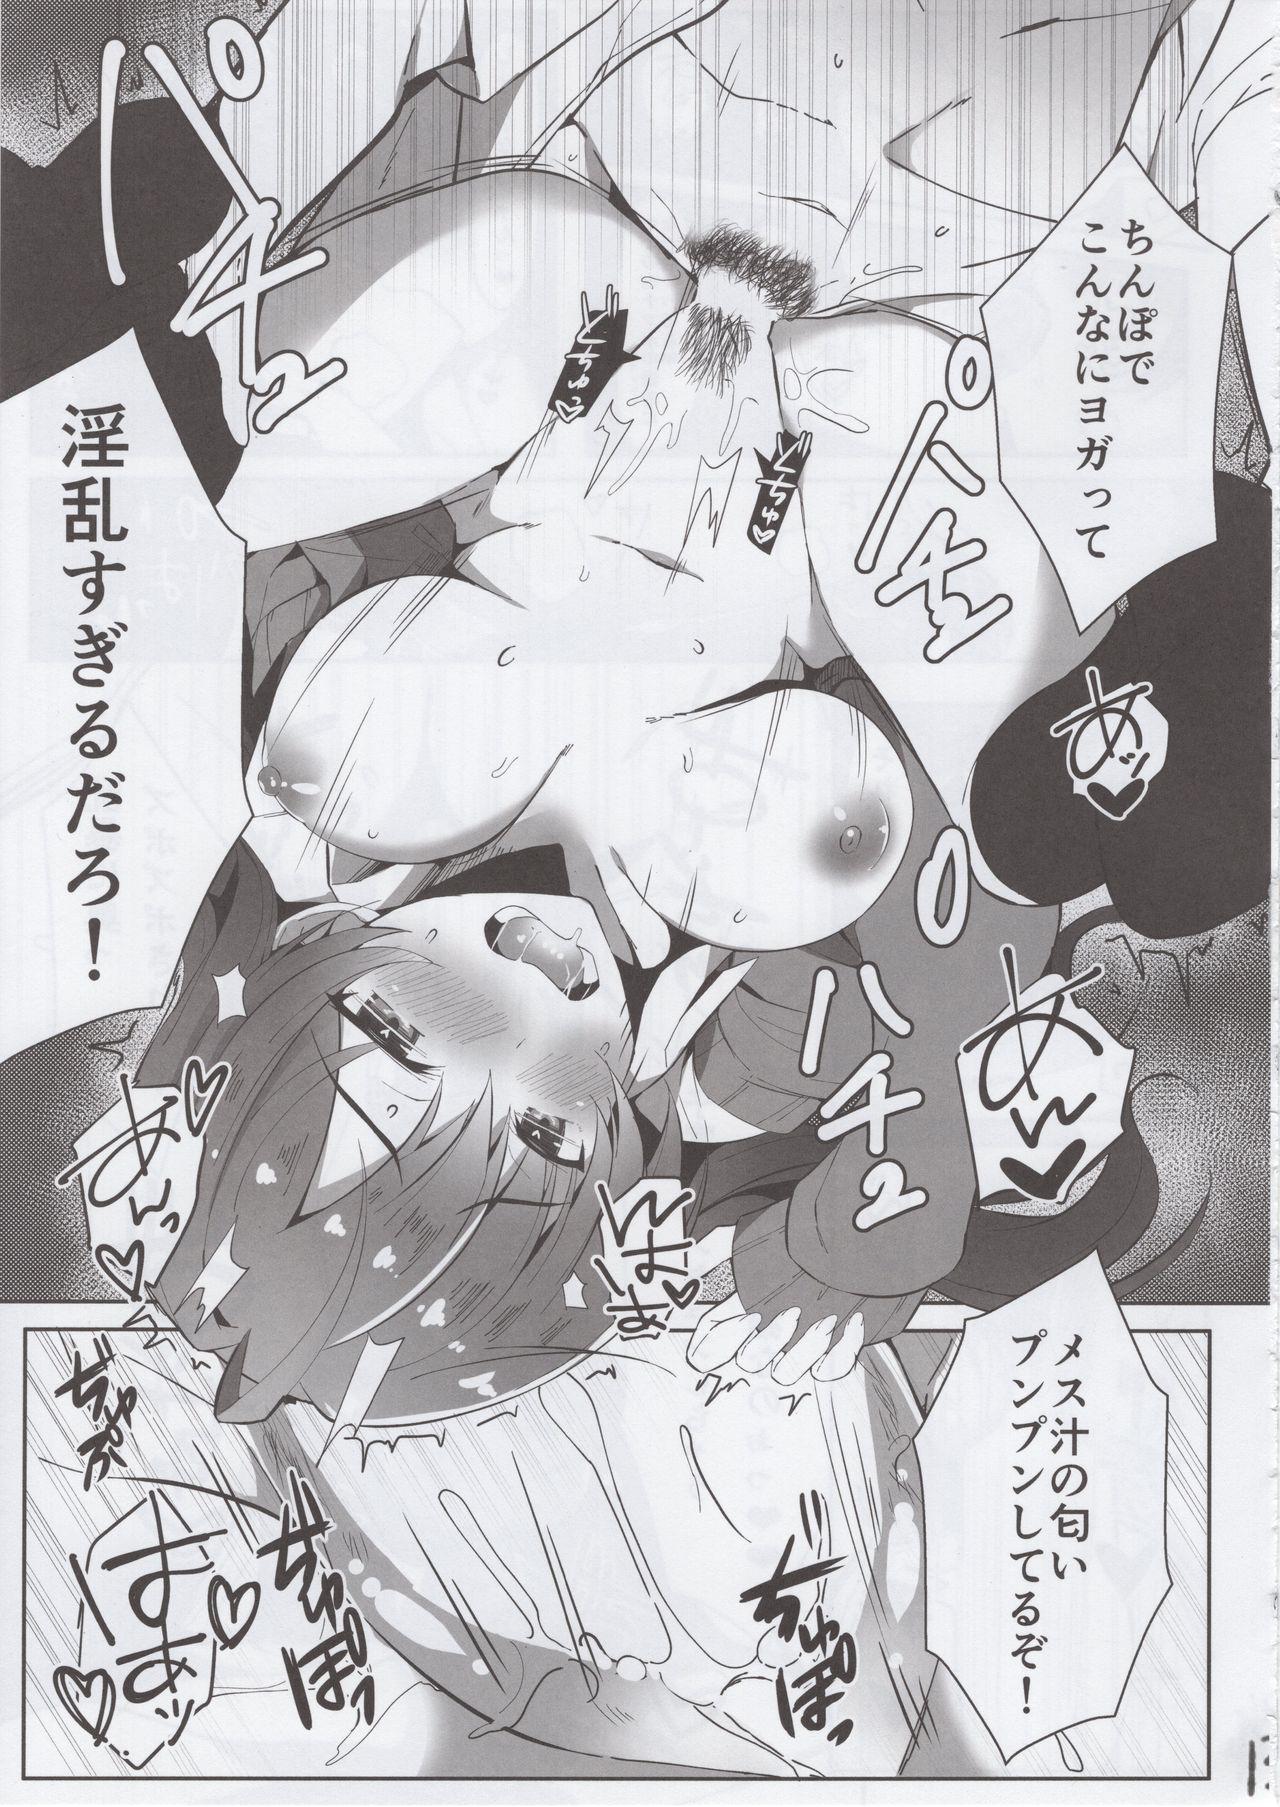 (C92) [Takatakaya (Kaniyashiku)] Koishiki (THE IDOLM@STER CINDERELLA GIRLS) 11